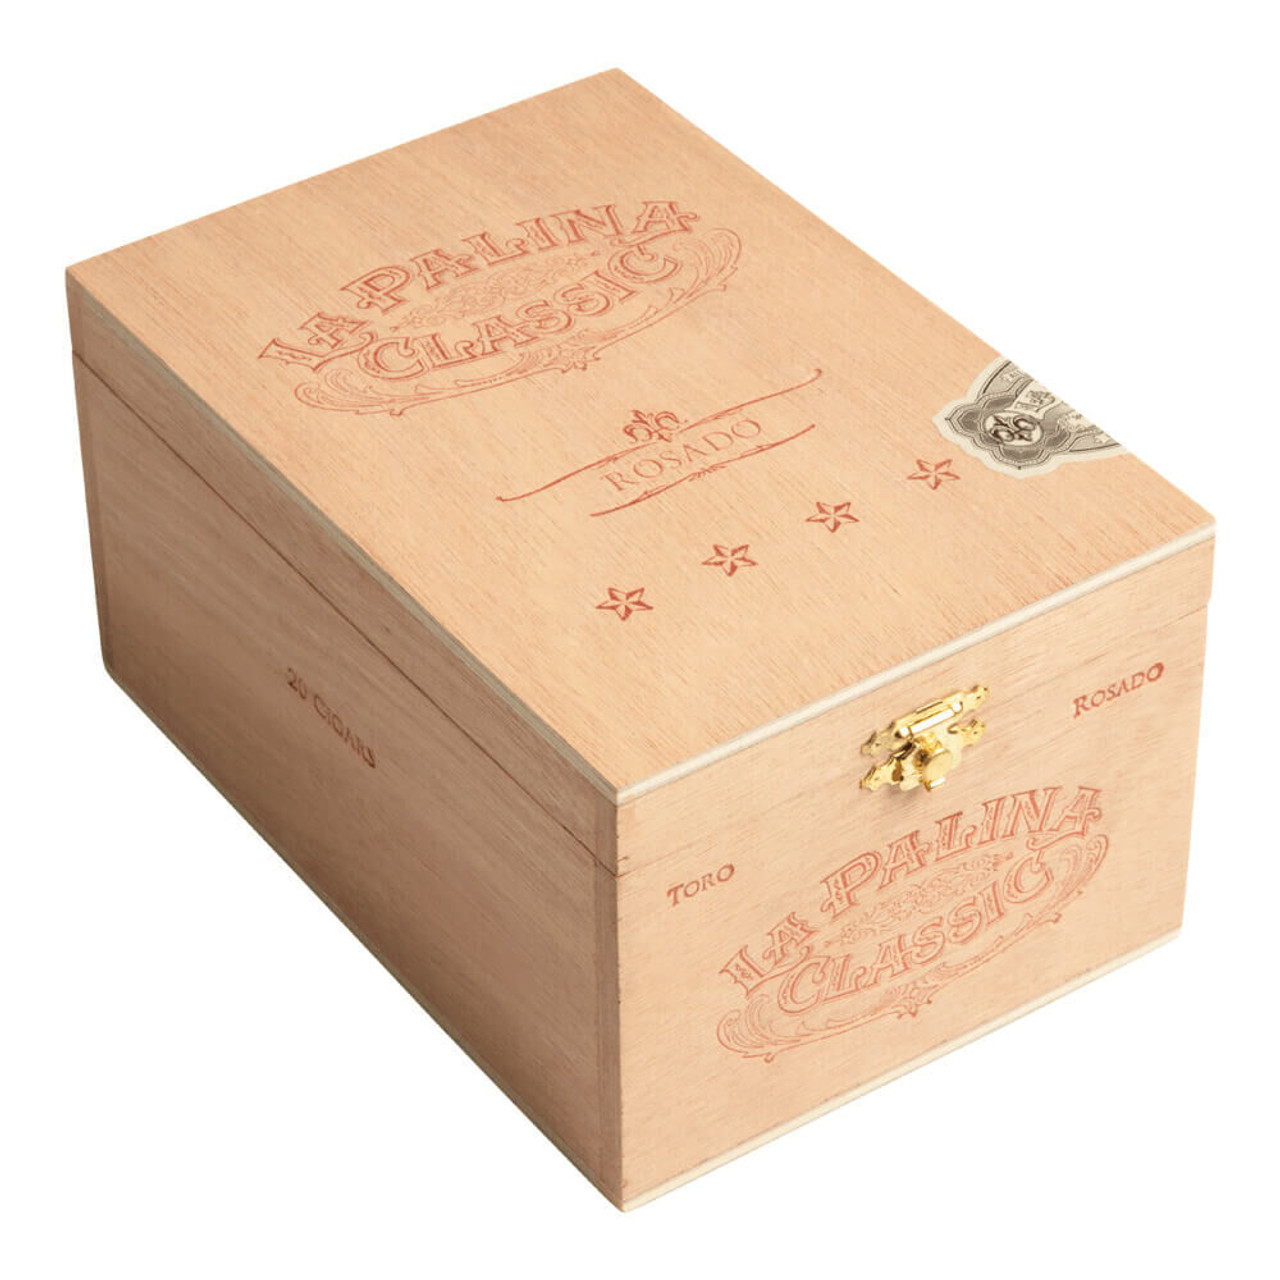 La Palina Classic Rosado Lonsdale Cigars - 6.5 x 44 (Box of 20)